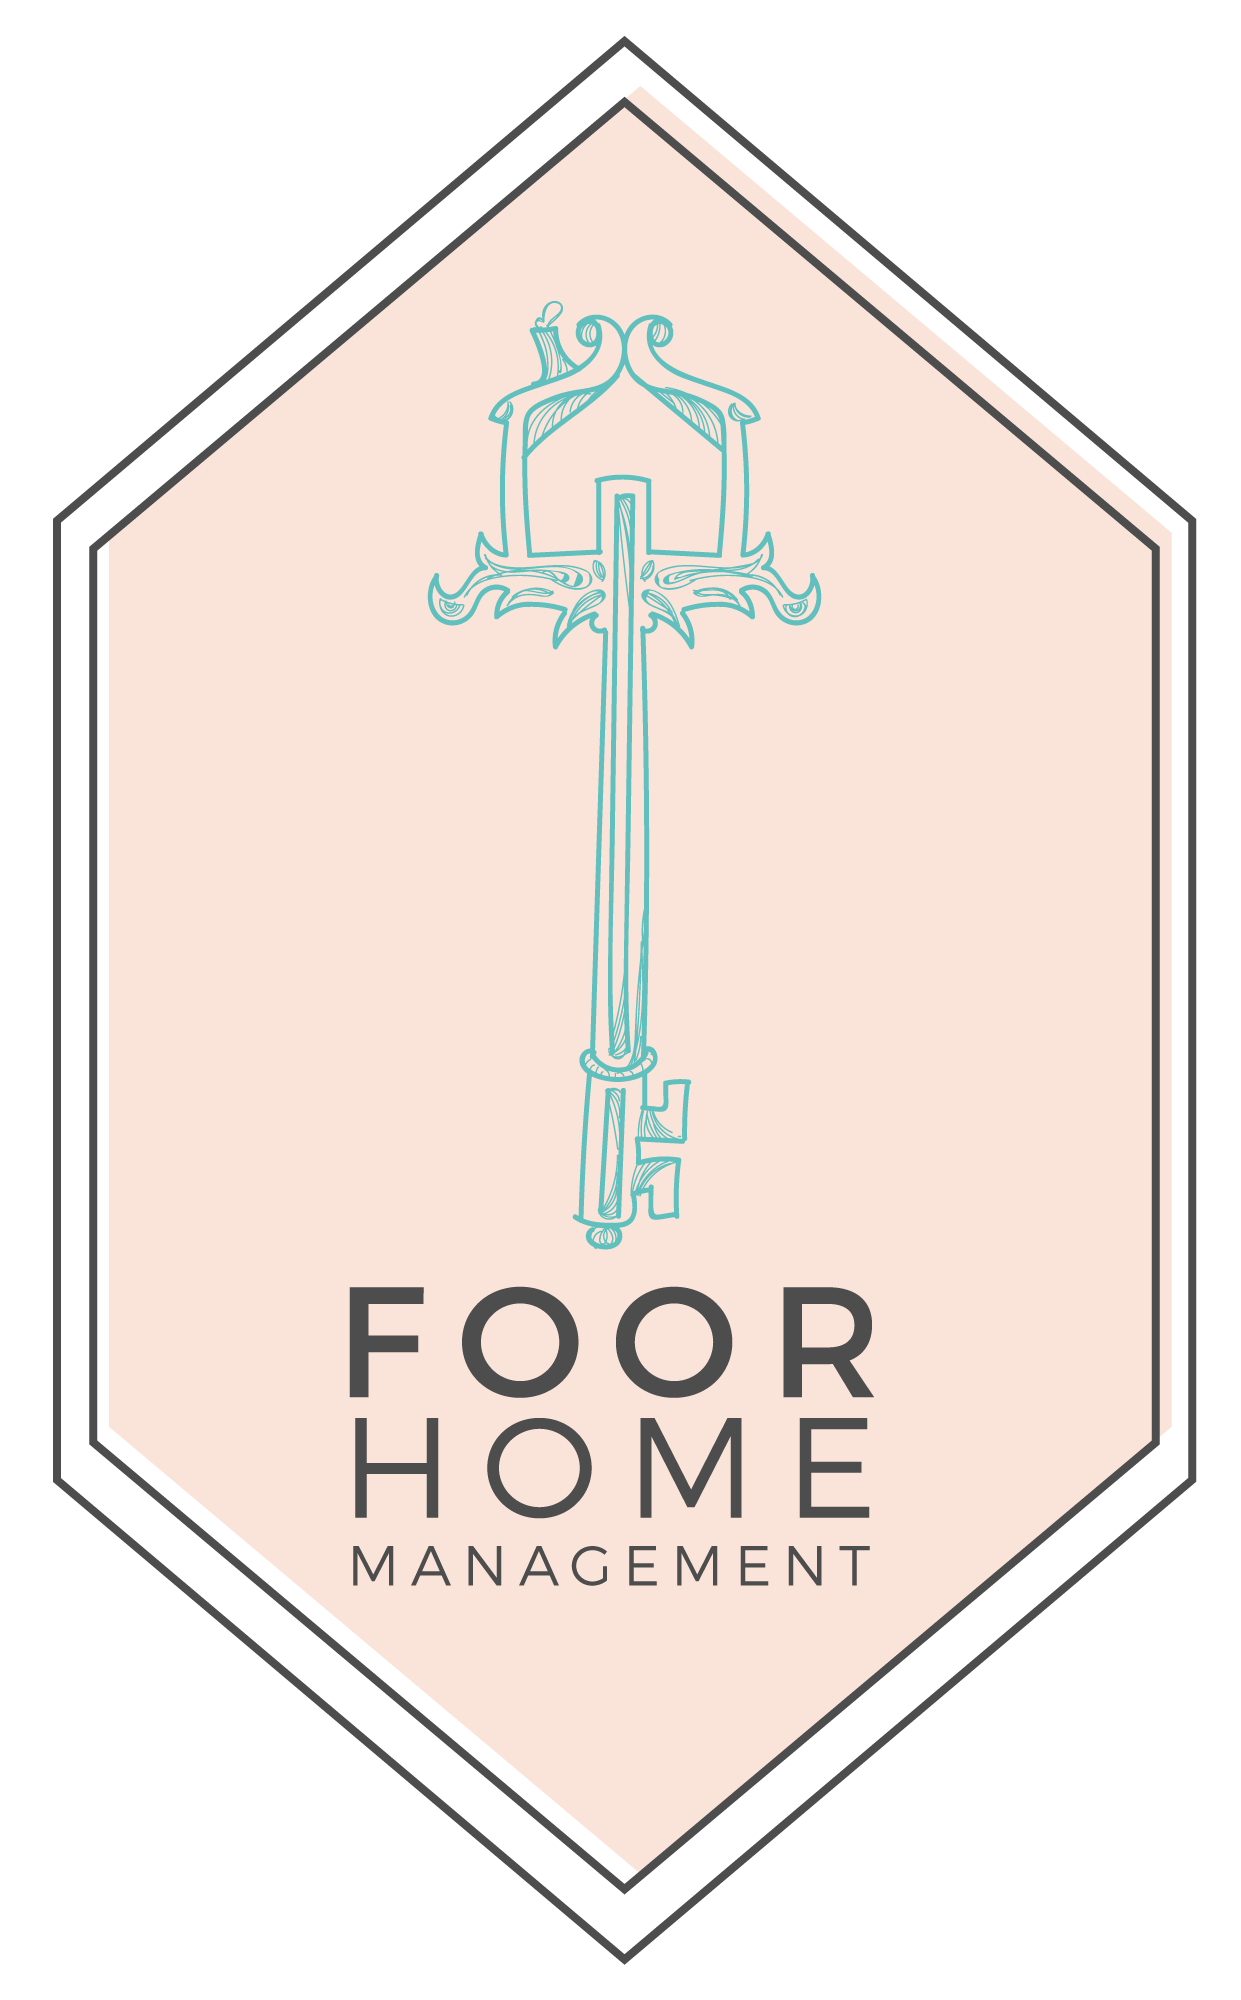 foor-home-management-main-logo.png